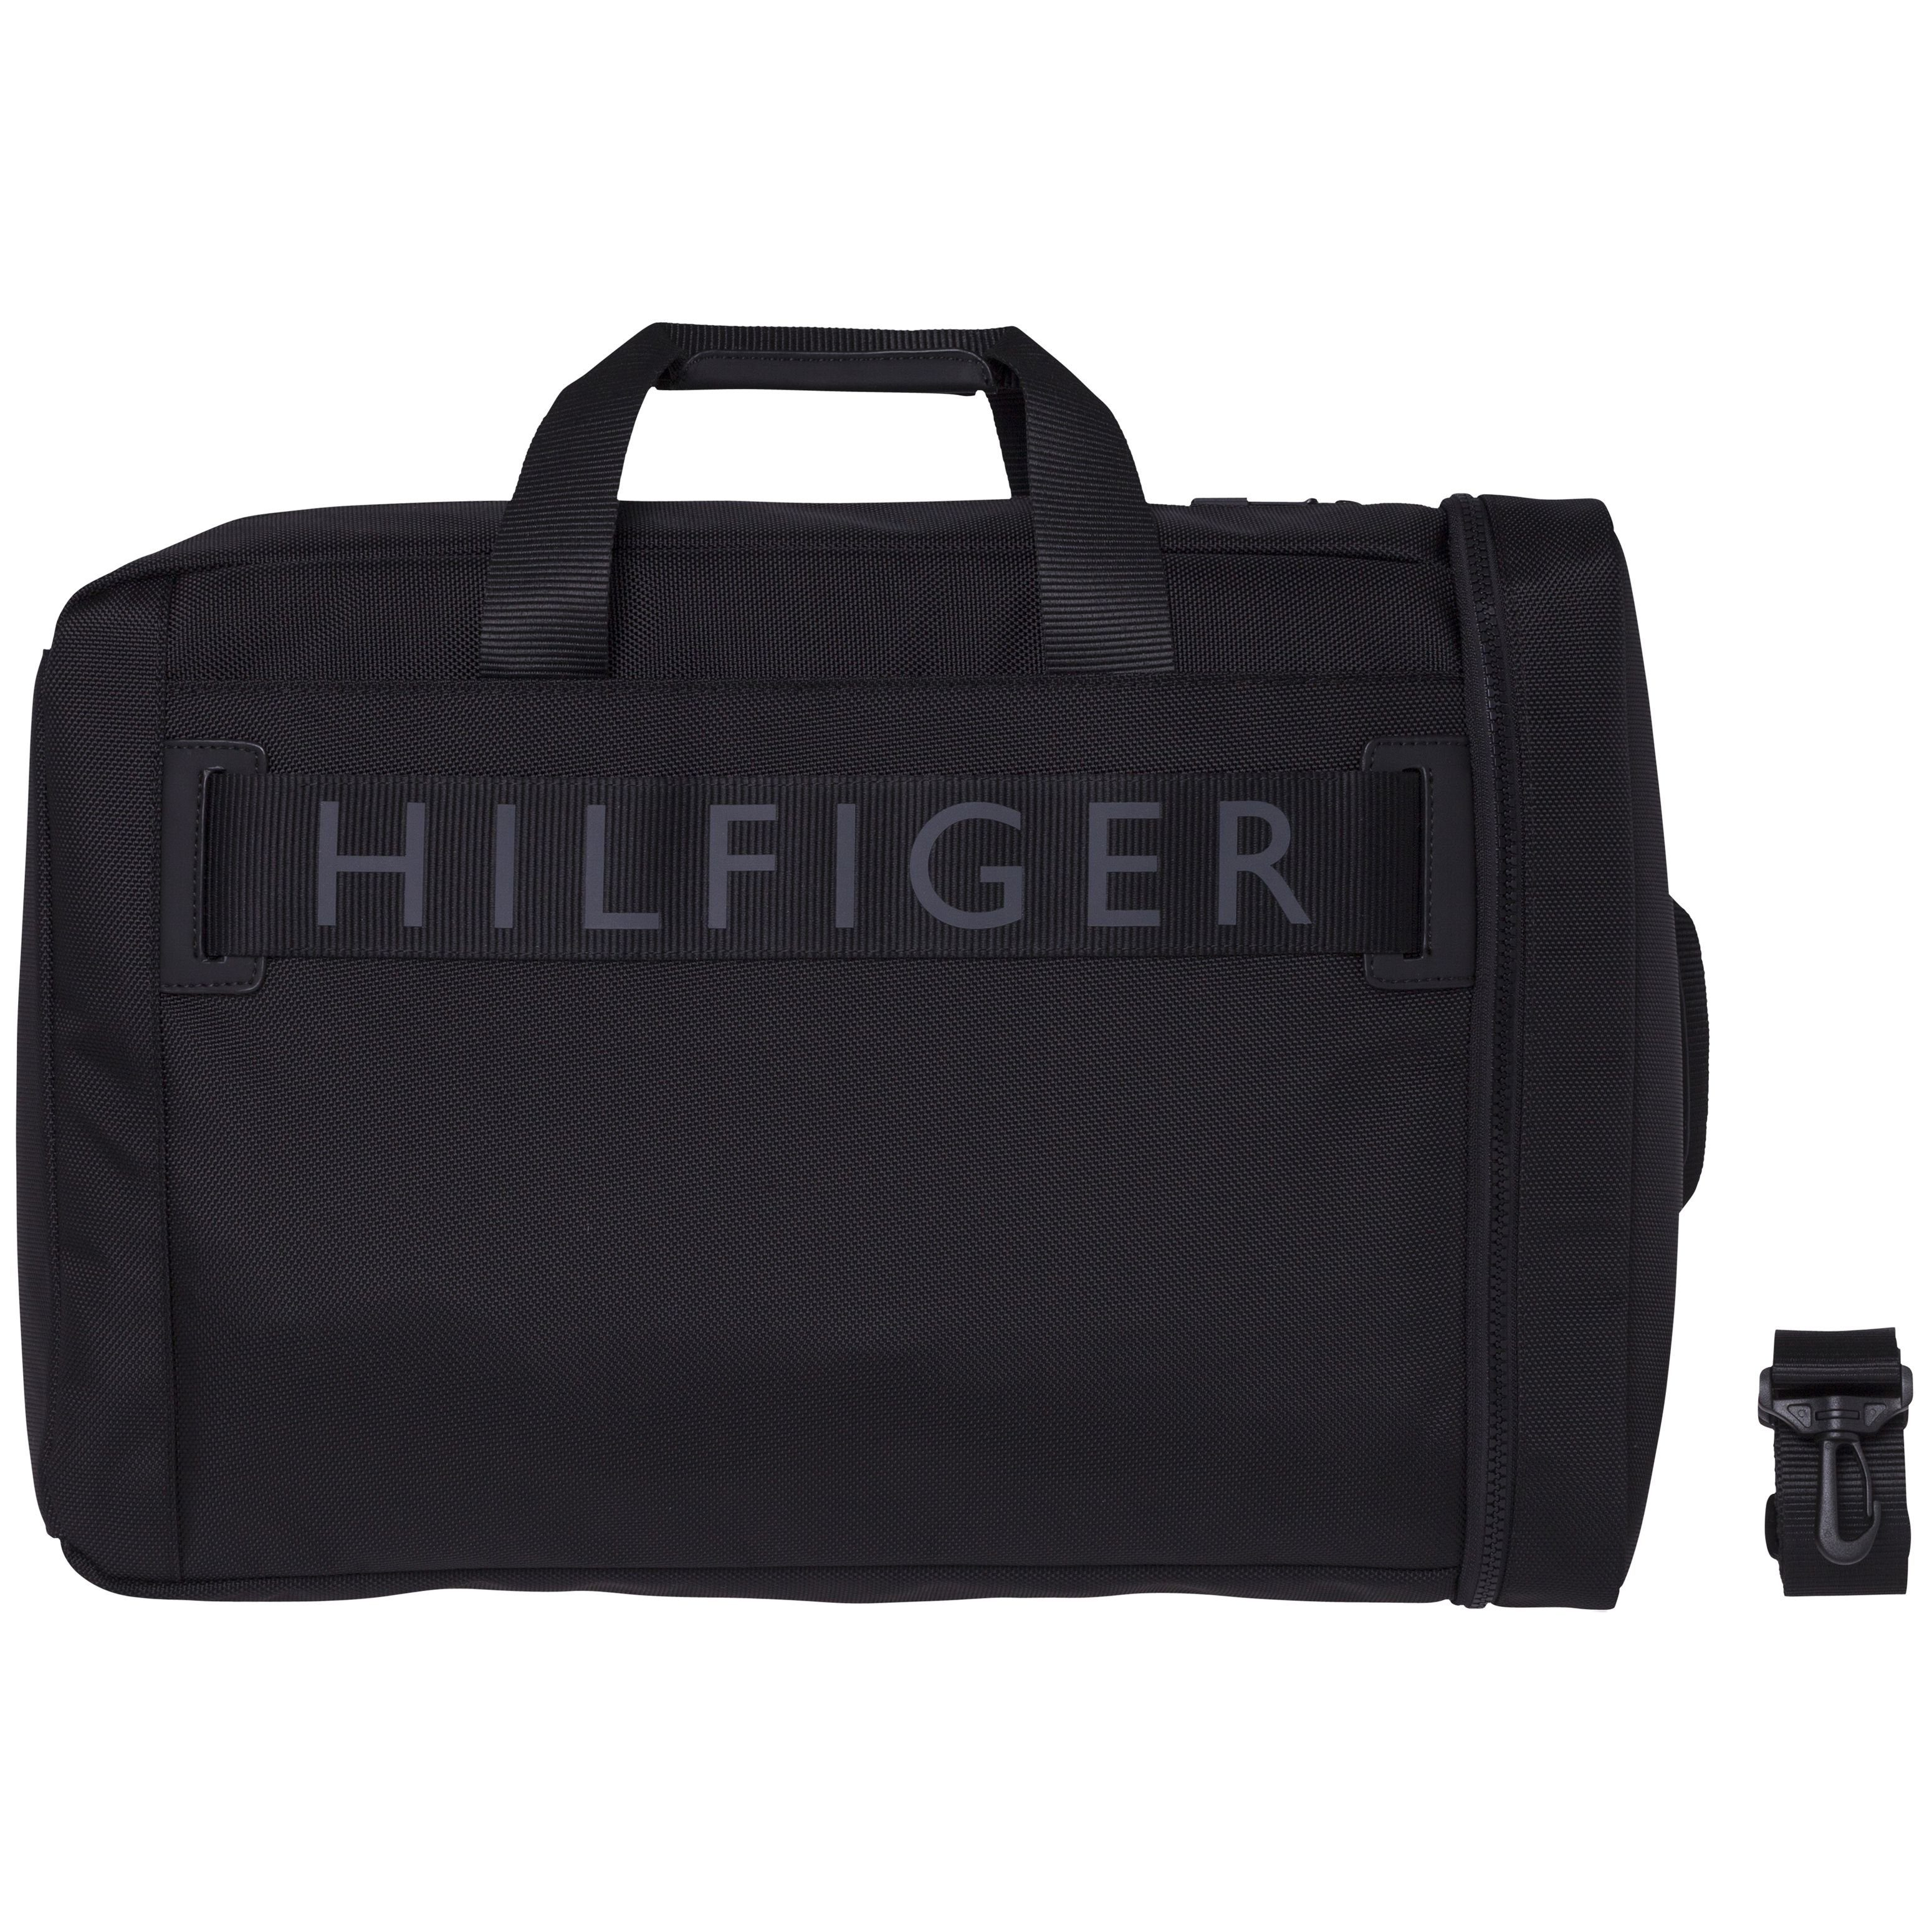 Tommy Hilfiger Handtasche »HILFIGER CONVERTIBLE COMPUTER BAG«